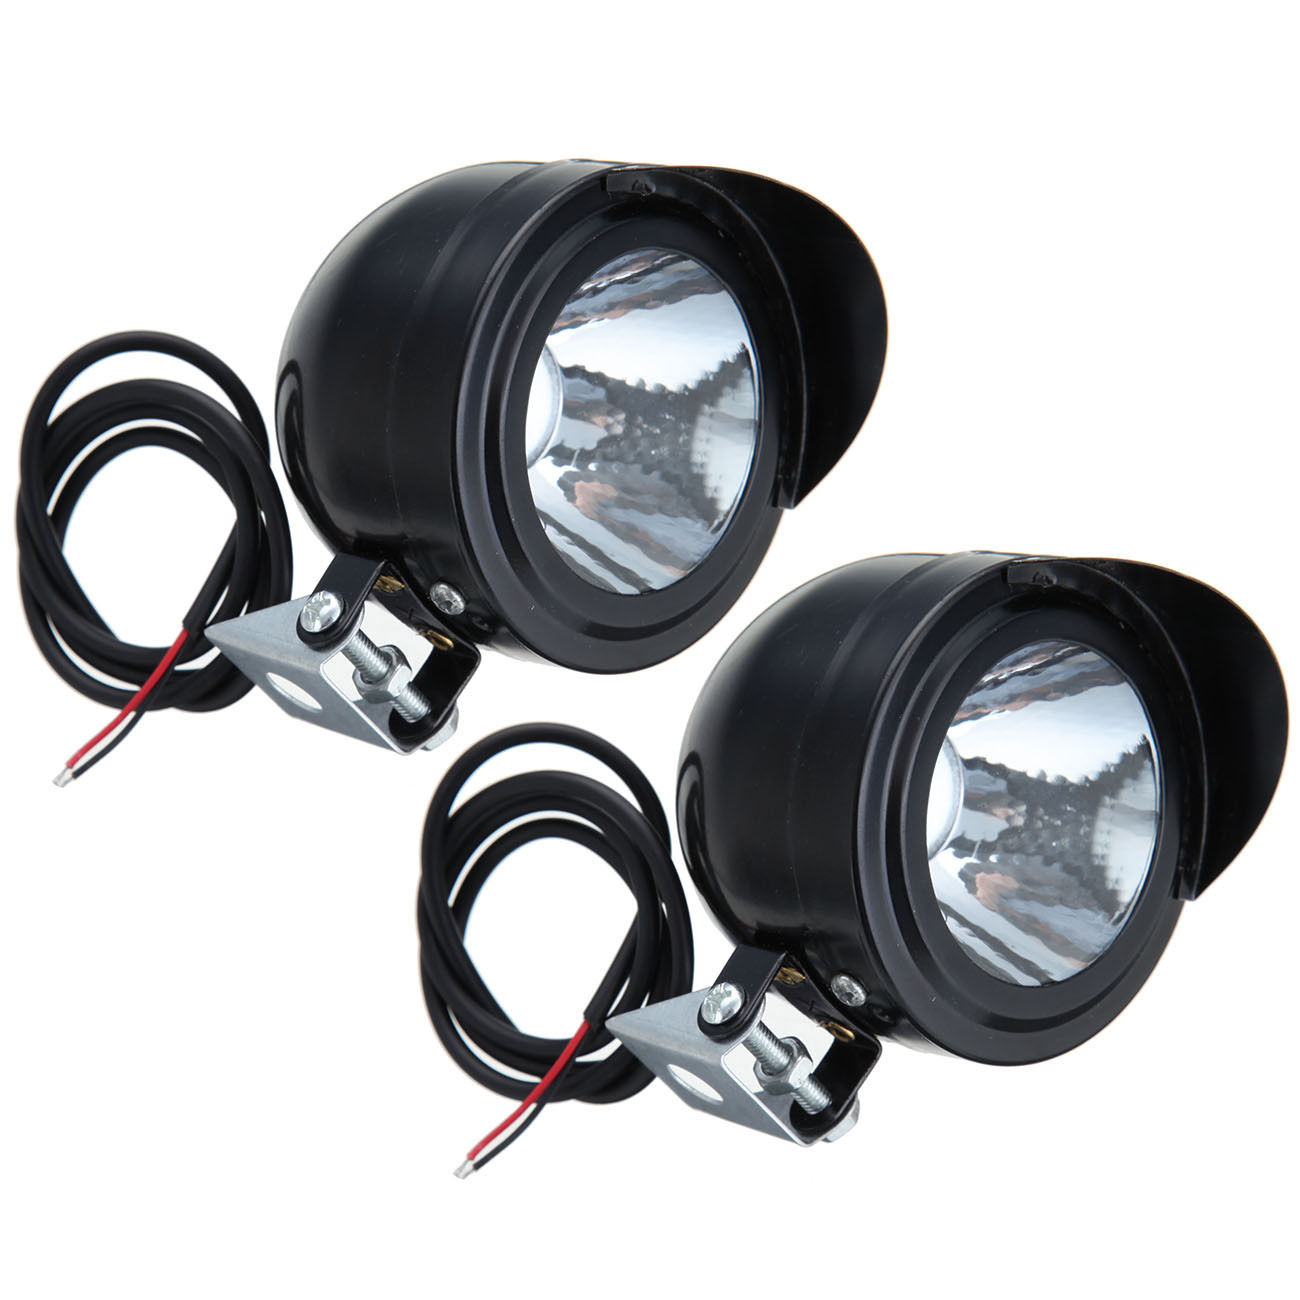 4pcs black rubber band pvc ring for t6 led headlight bike headlamp bicycle PT